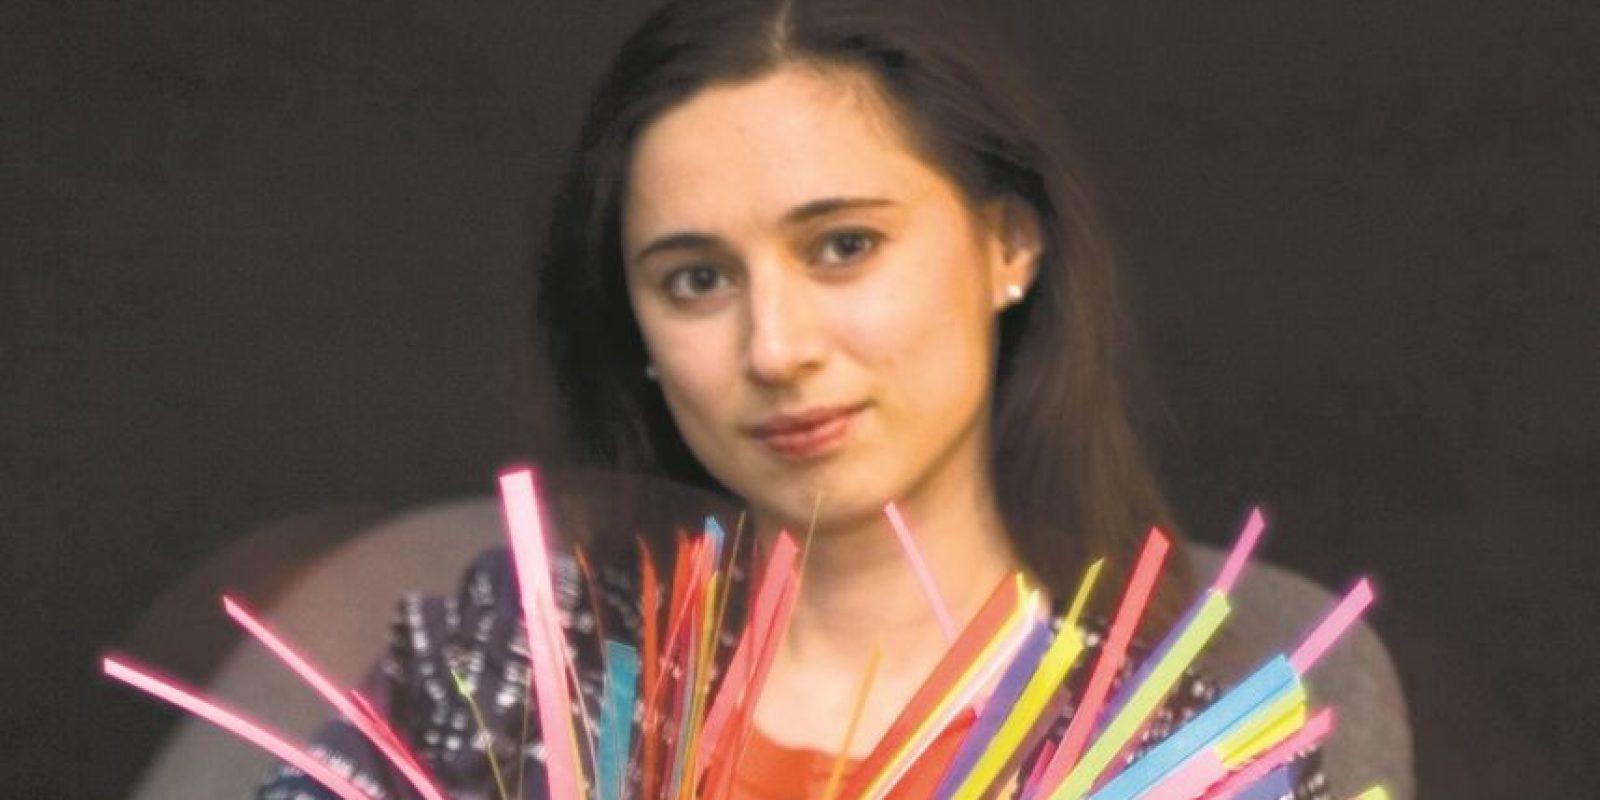 YULIA BRODSKAYA. Artista de origen ruso